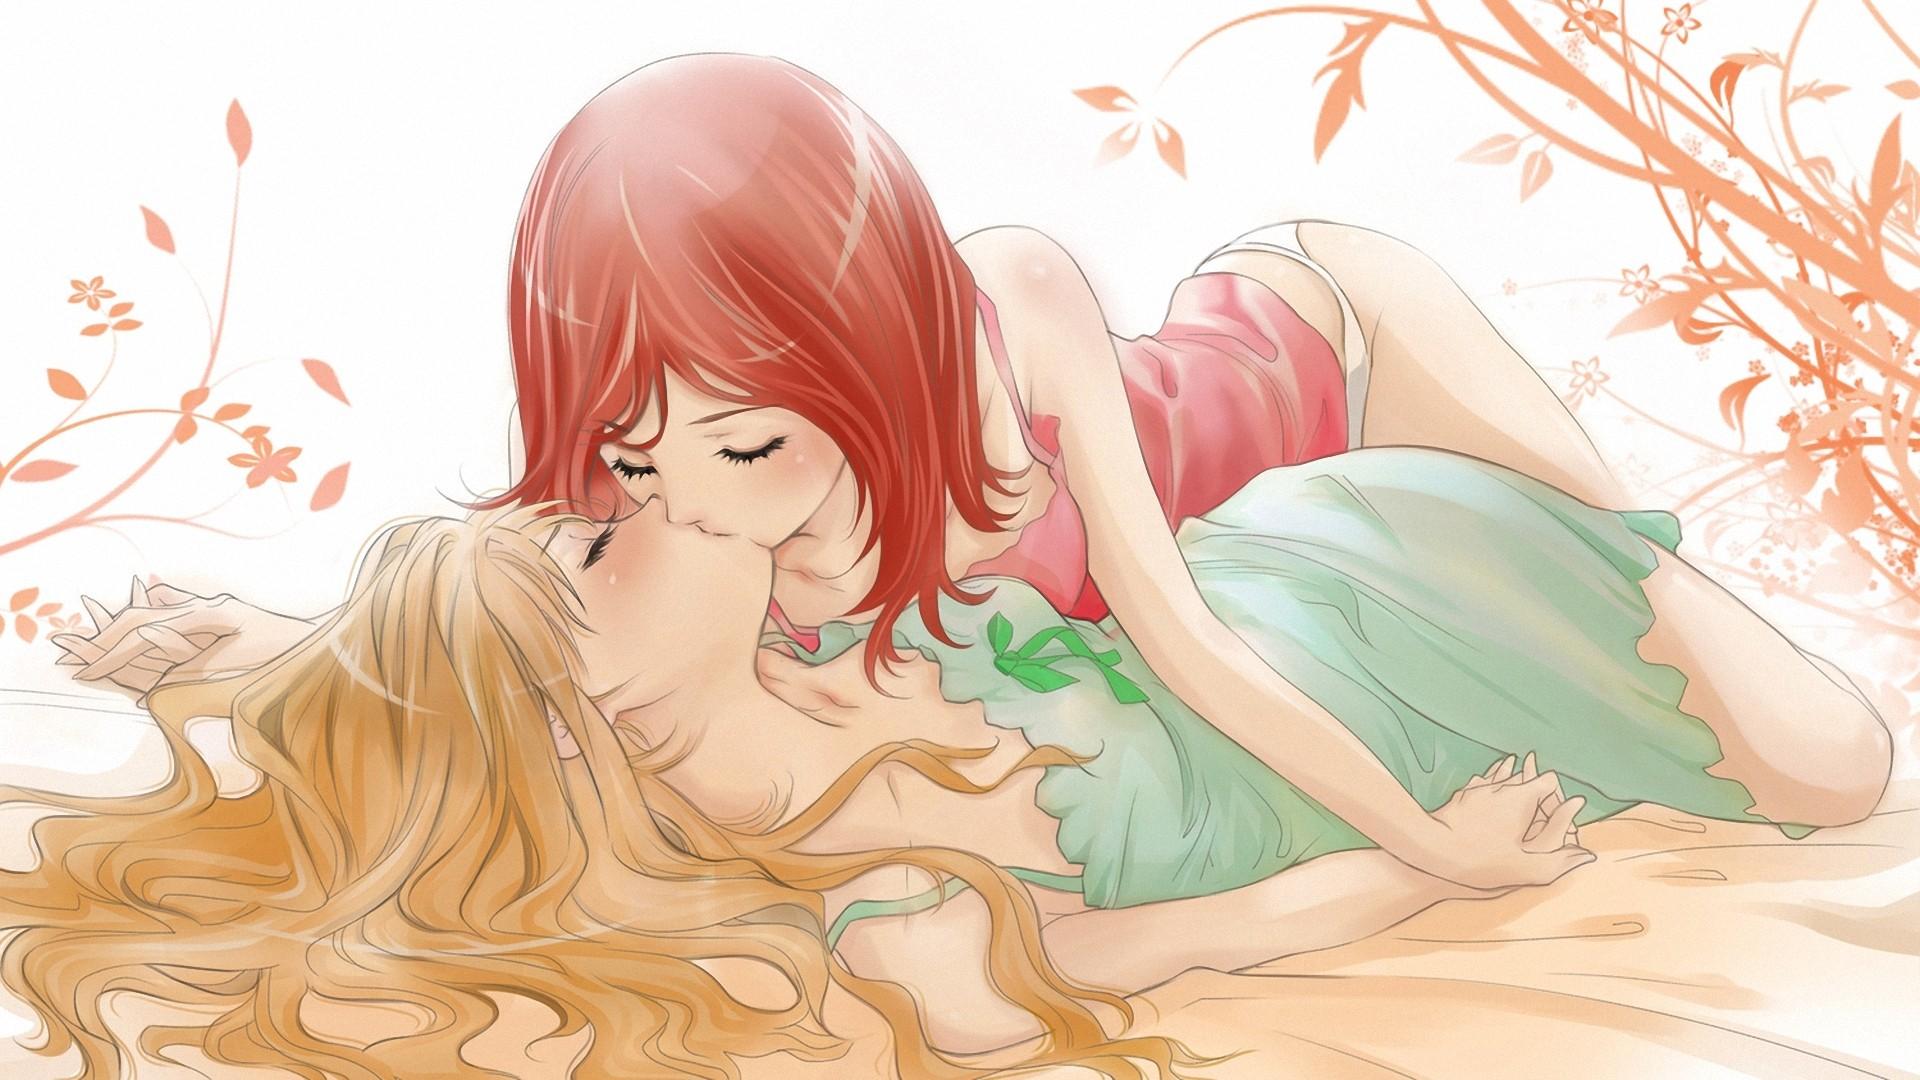 Anime 1920x1080 kissing yuri anime closed eyes lesbians